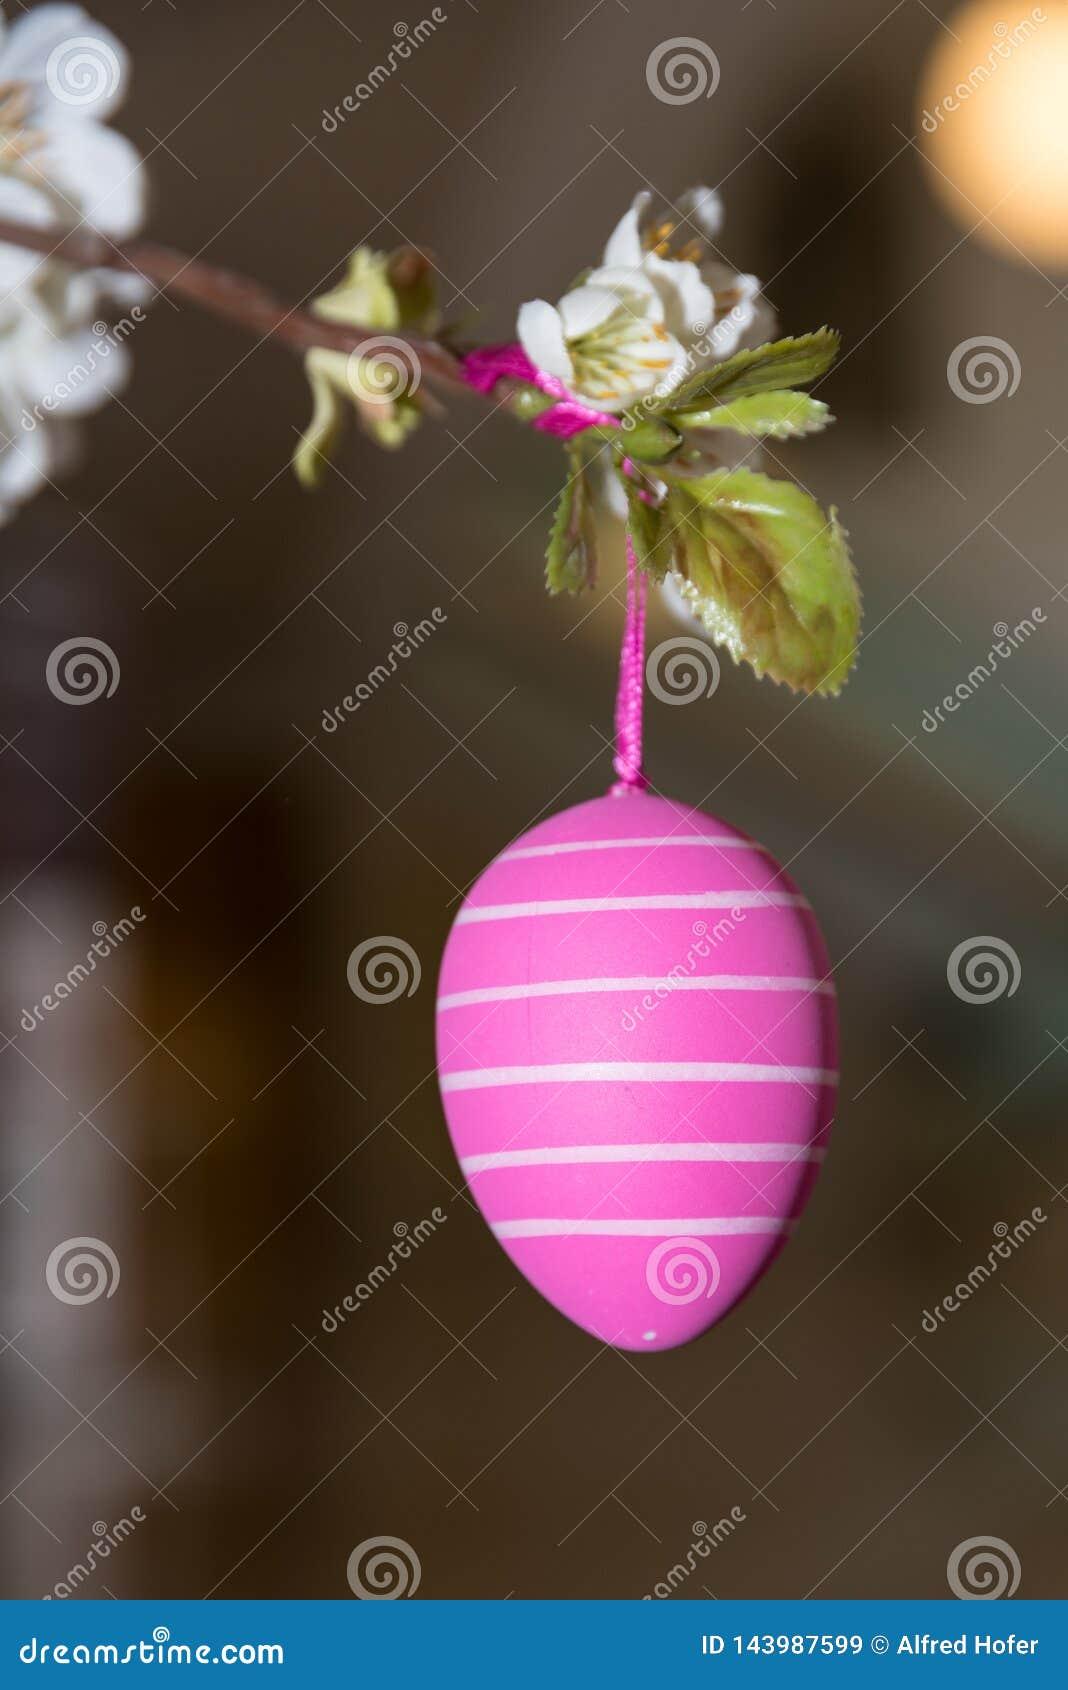 Handpainted pink Easter egg - closeup